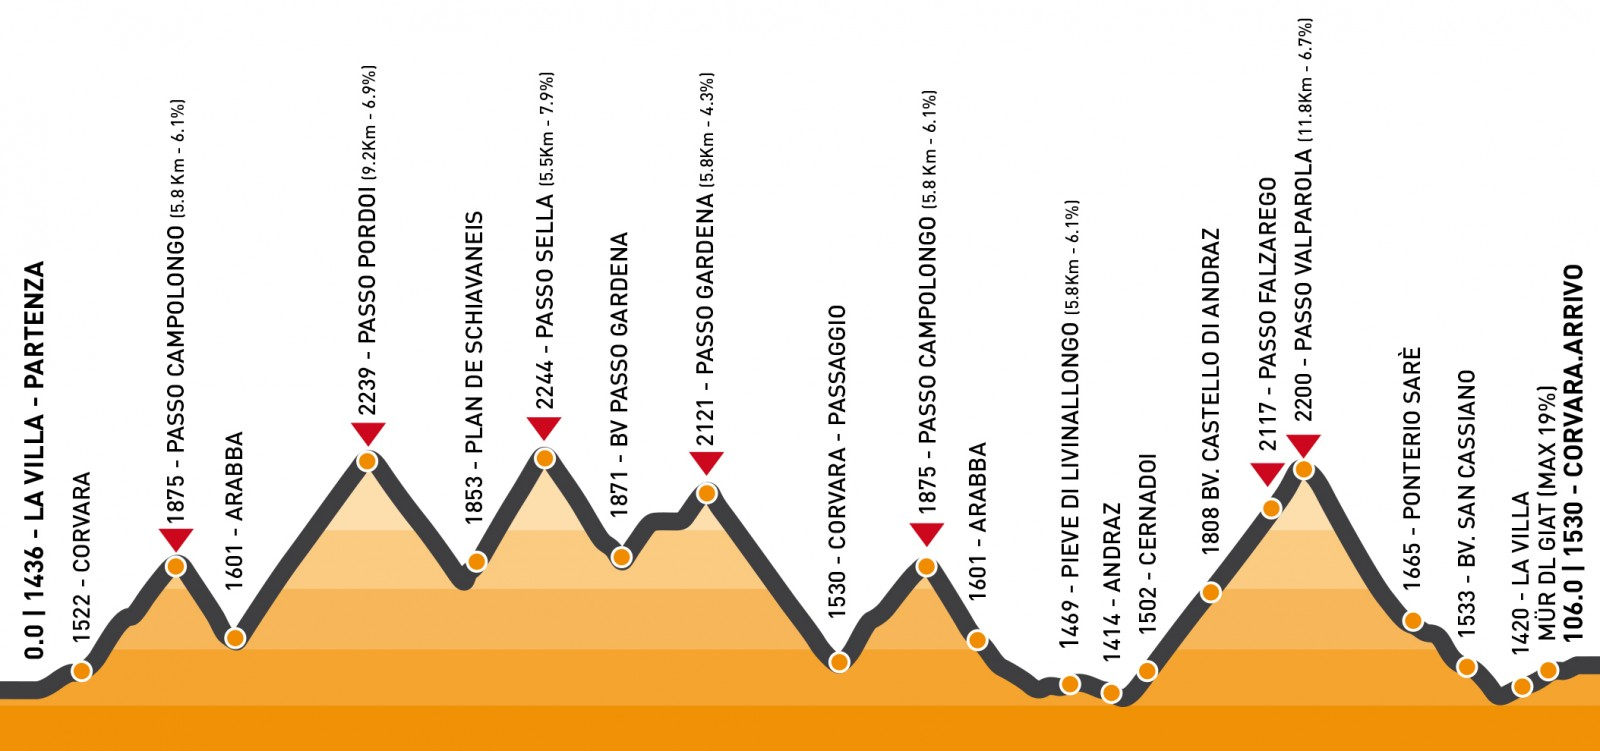 Maratona dles Dolomites Höhenprofil Mittlere Strecke 2014